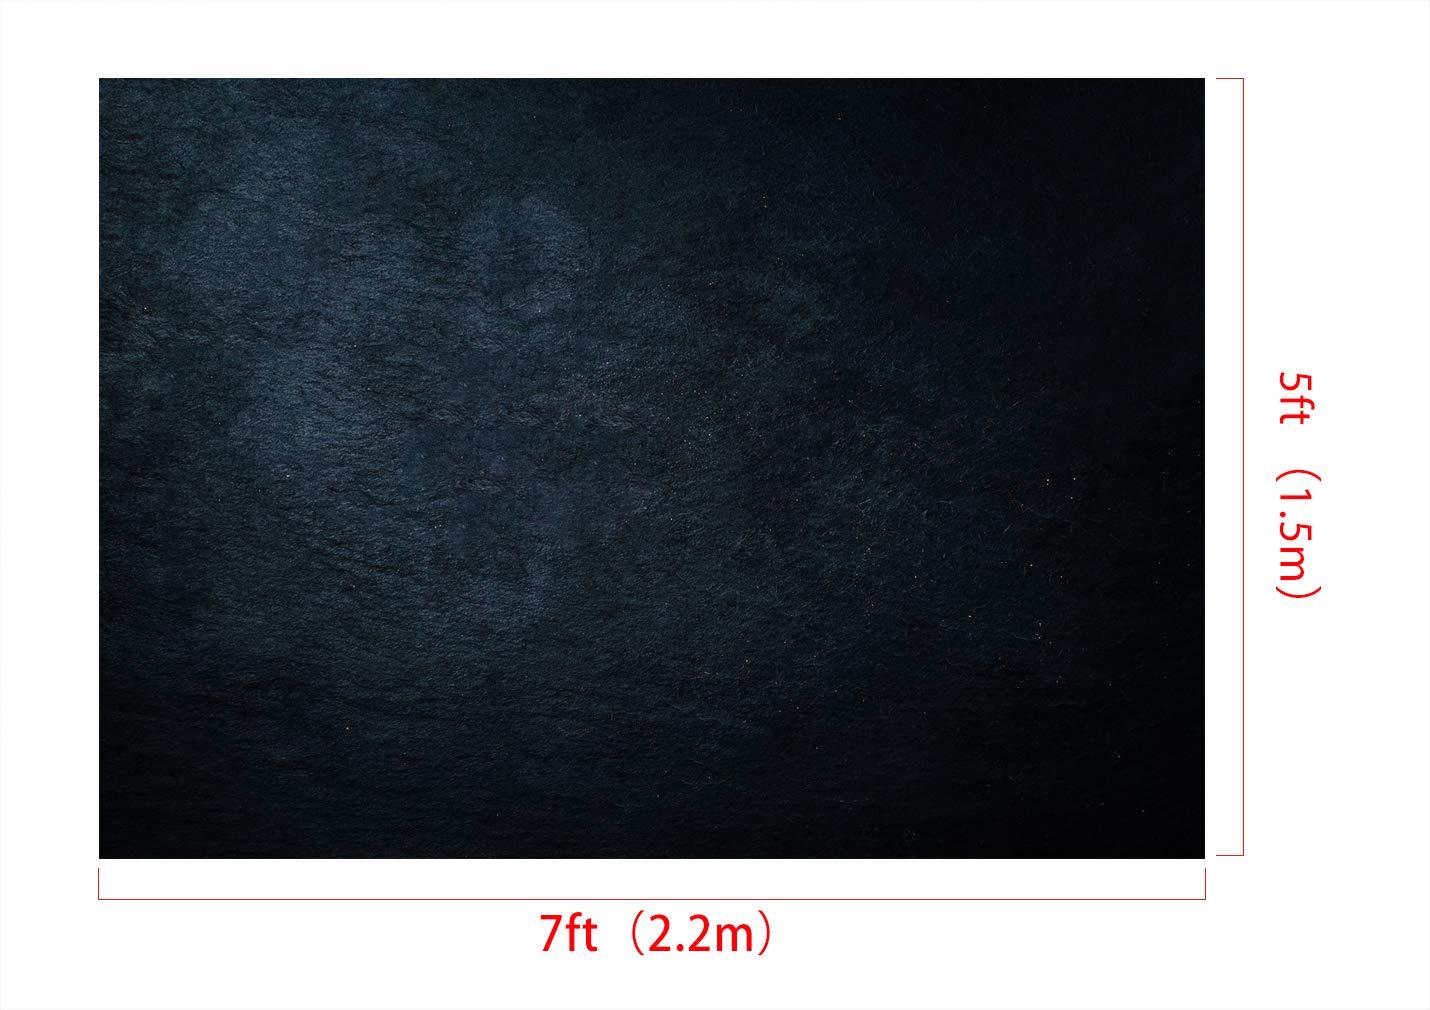 Zeller 18121 30 x 12 x 30 cm Botiqu/ín met/álico Color Rojo